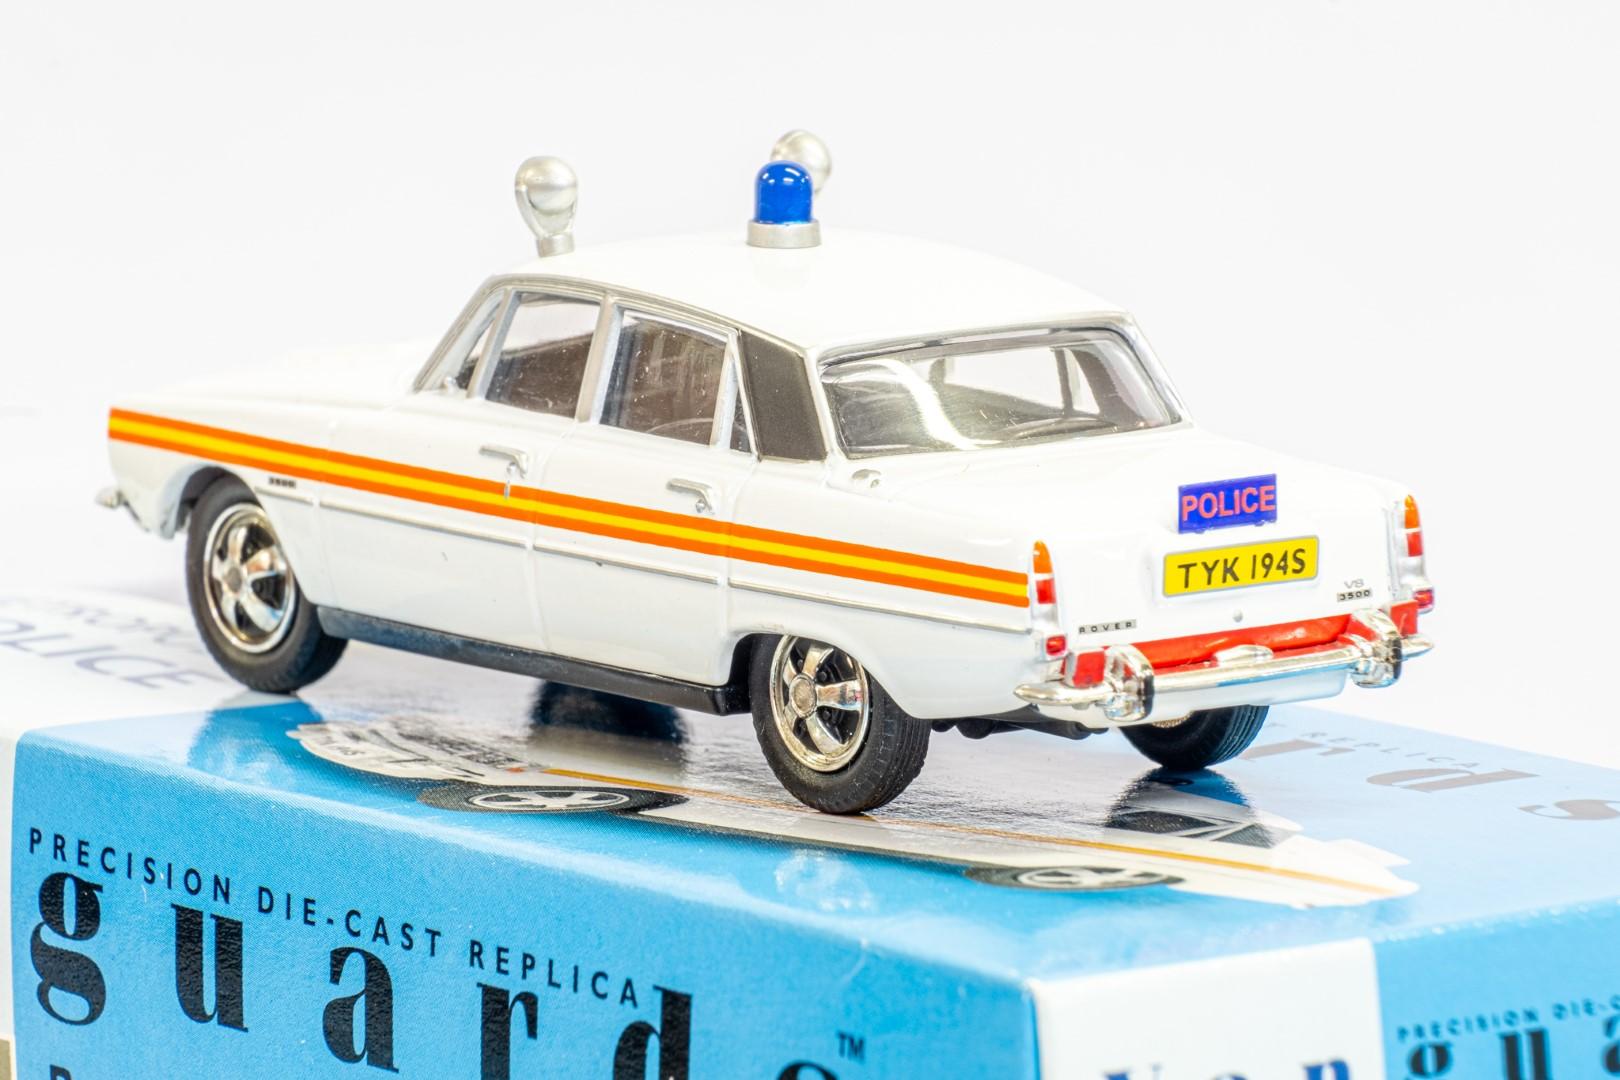 Vanguards Rover 3500 - Traffic Car - Image 6 of 8